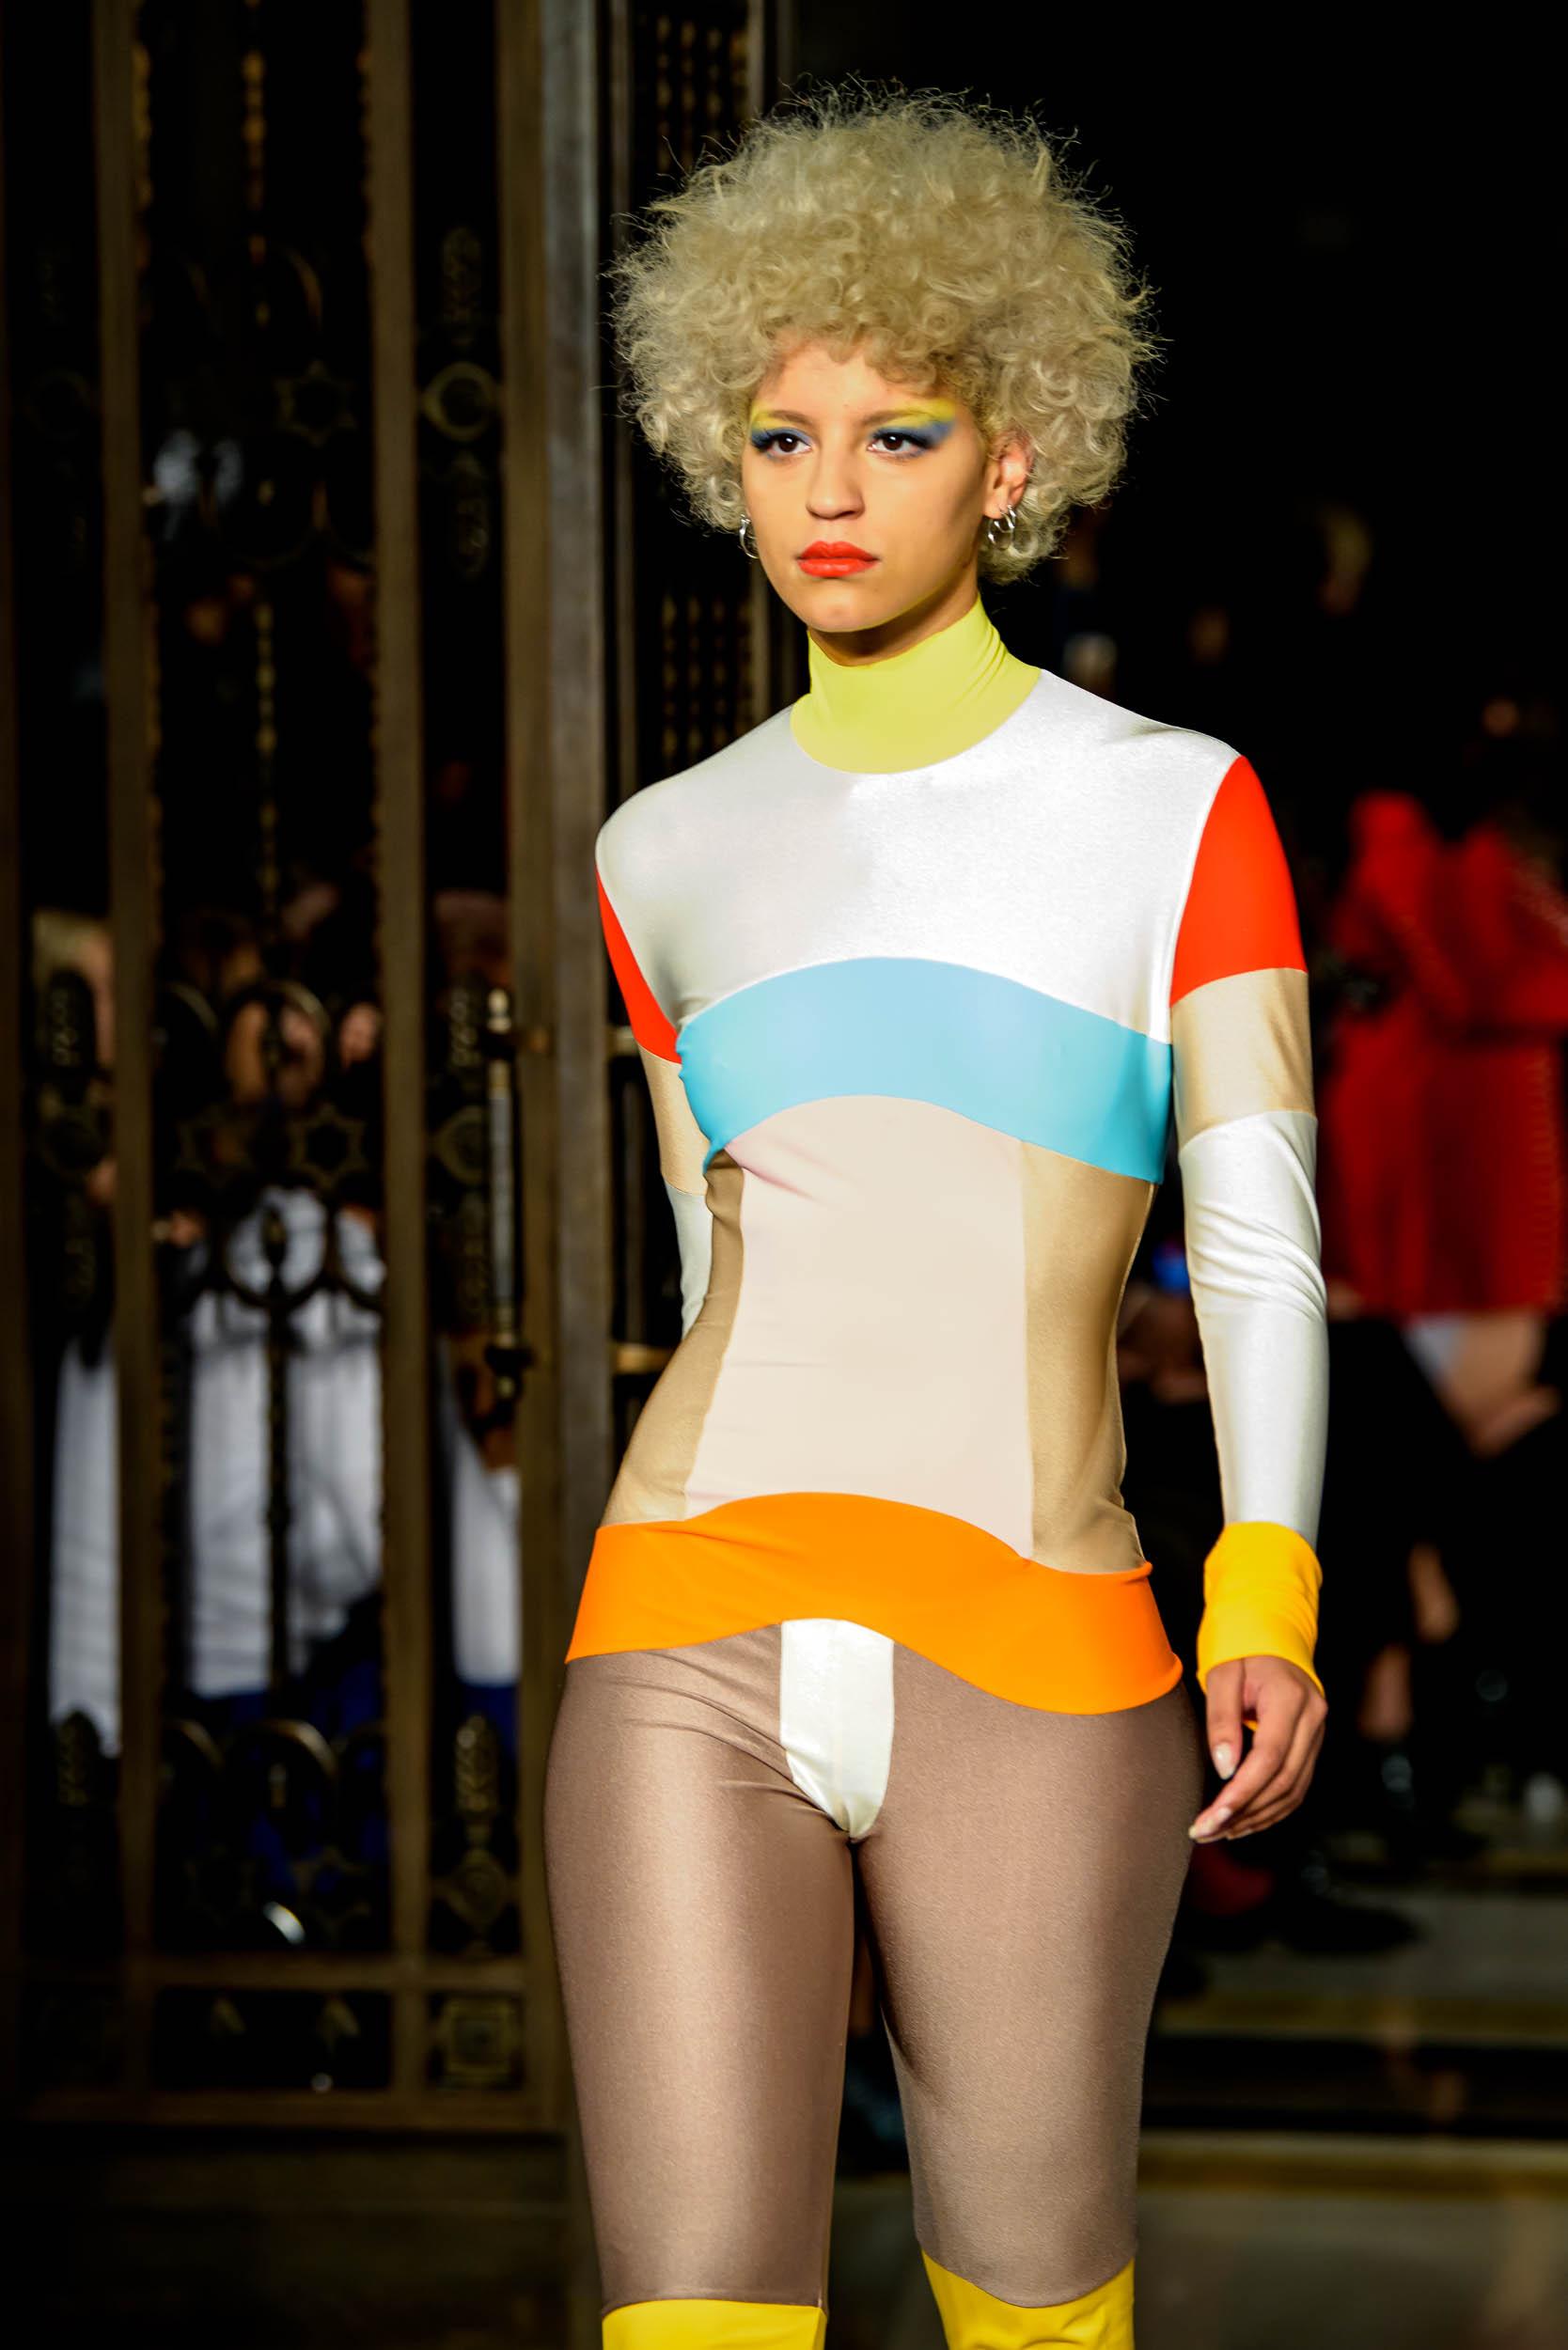 London Fashion Week S/S18 fashion by Pam Hogg photo Barry Green